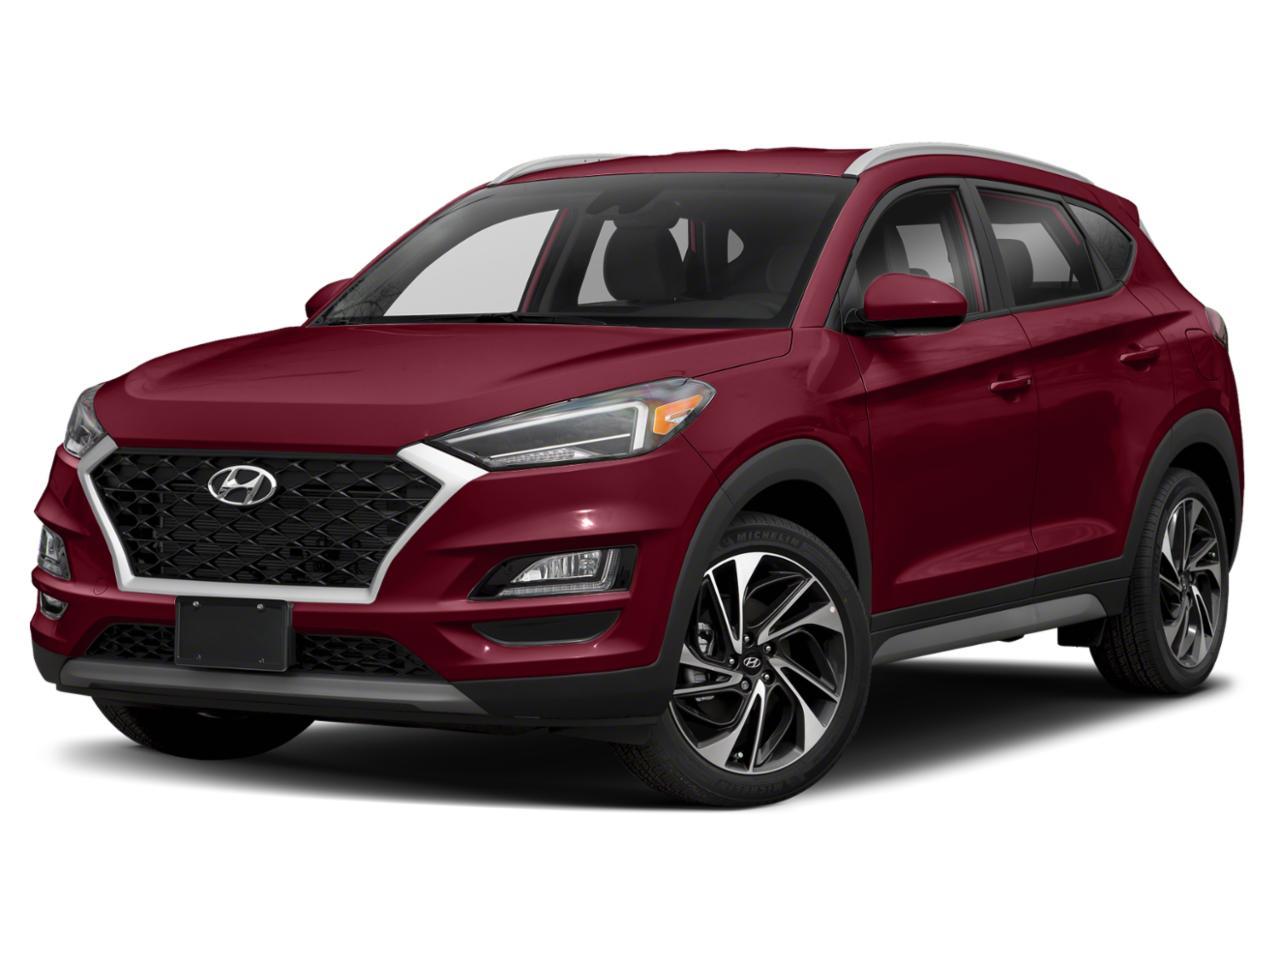 2019 Hyundai Tucson Vehicle Photo in Peoria, IL 61615